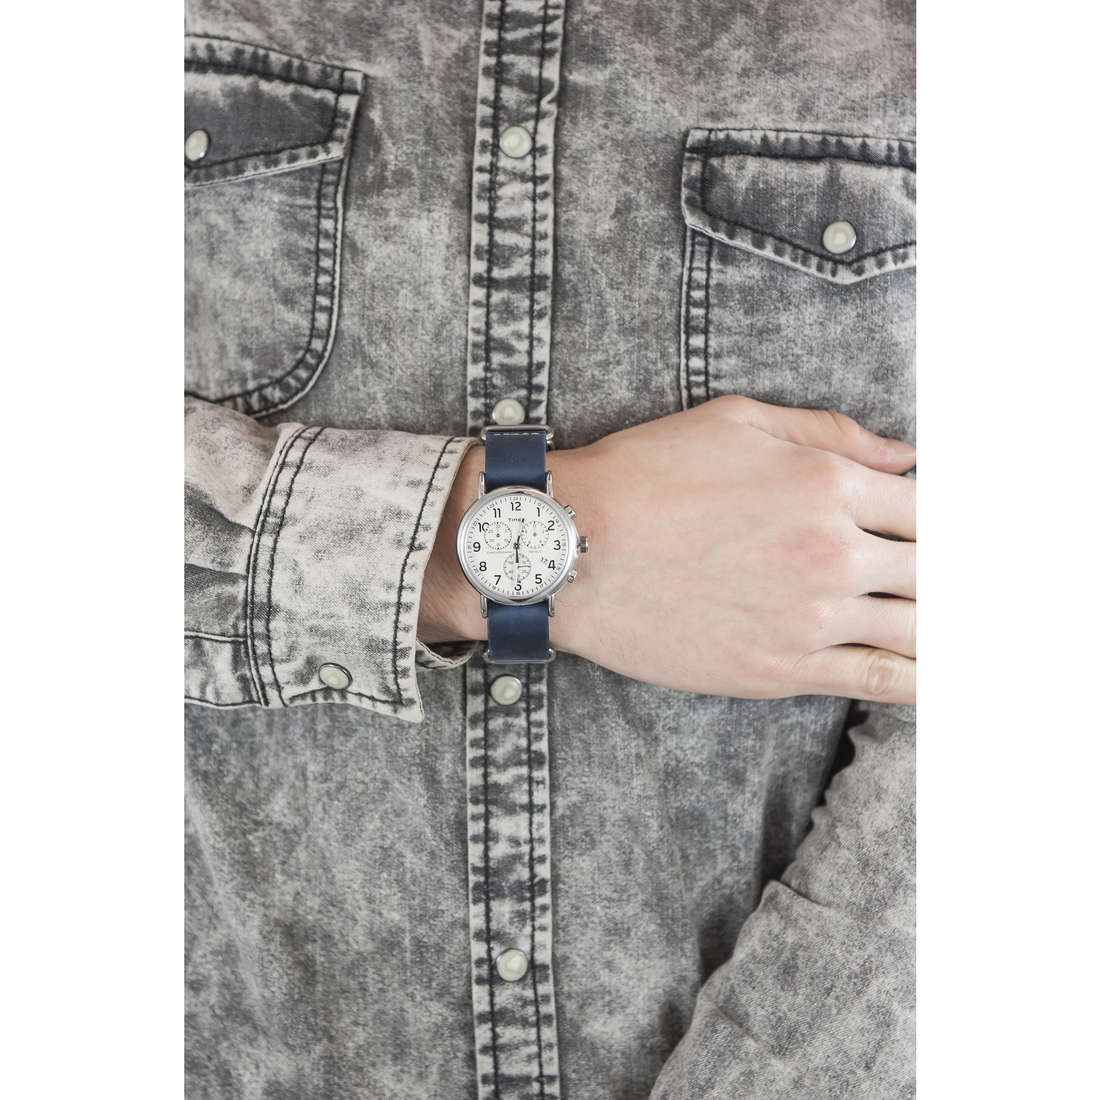 Timex cronografi Weekender uomo TW2P62100 indosso